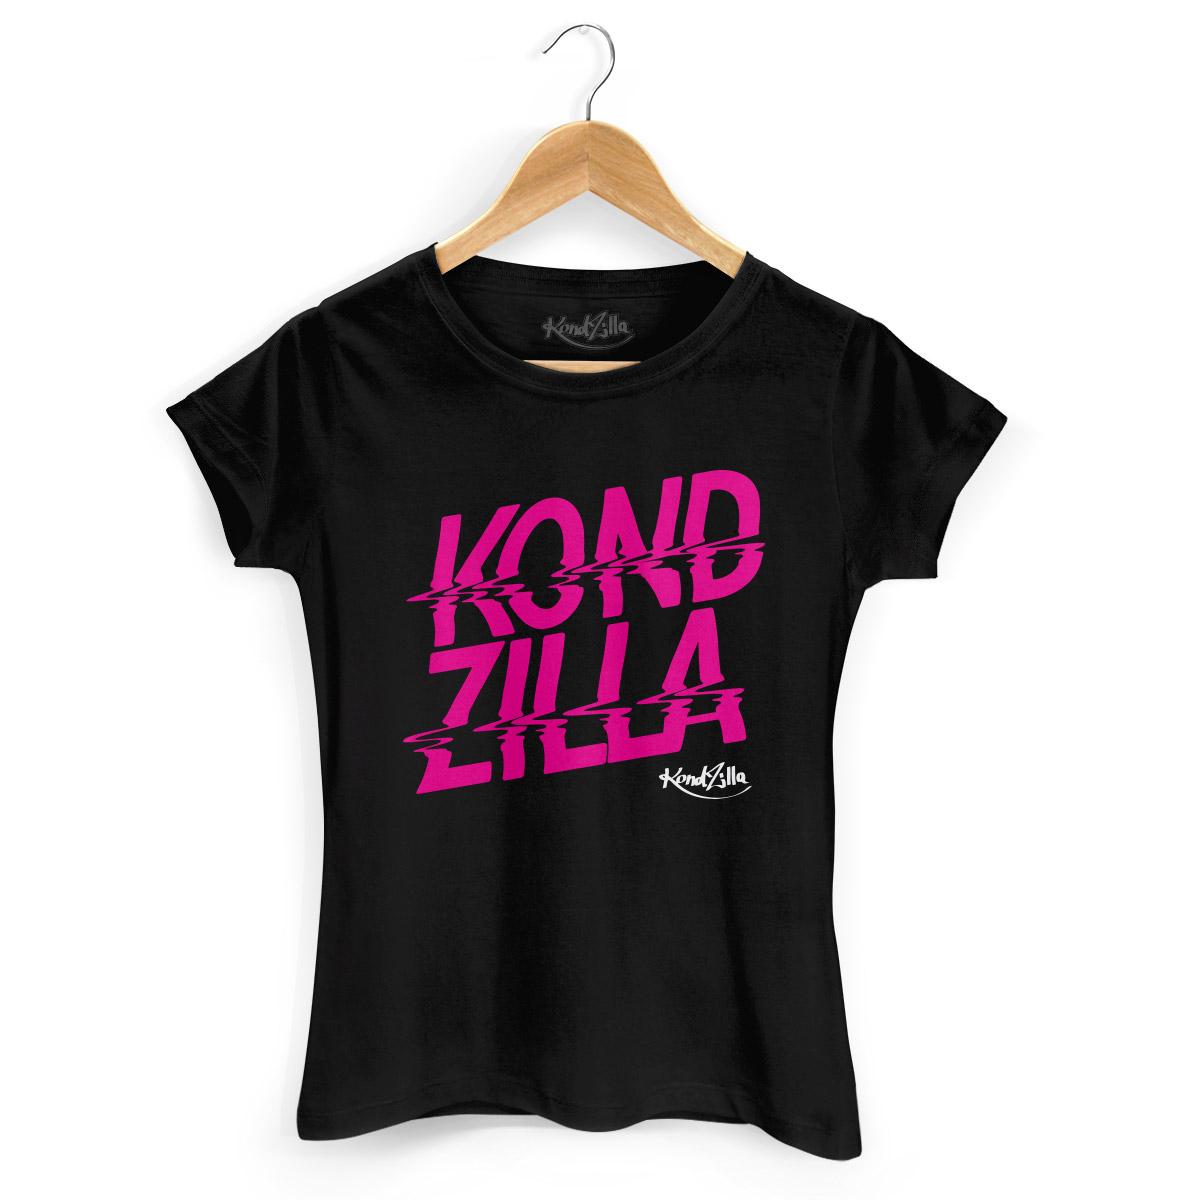 Camiseta Feminina Kondzilla Dance